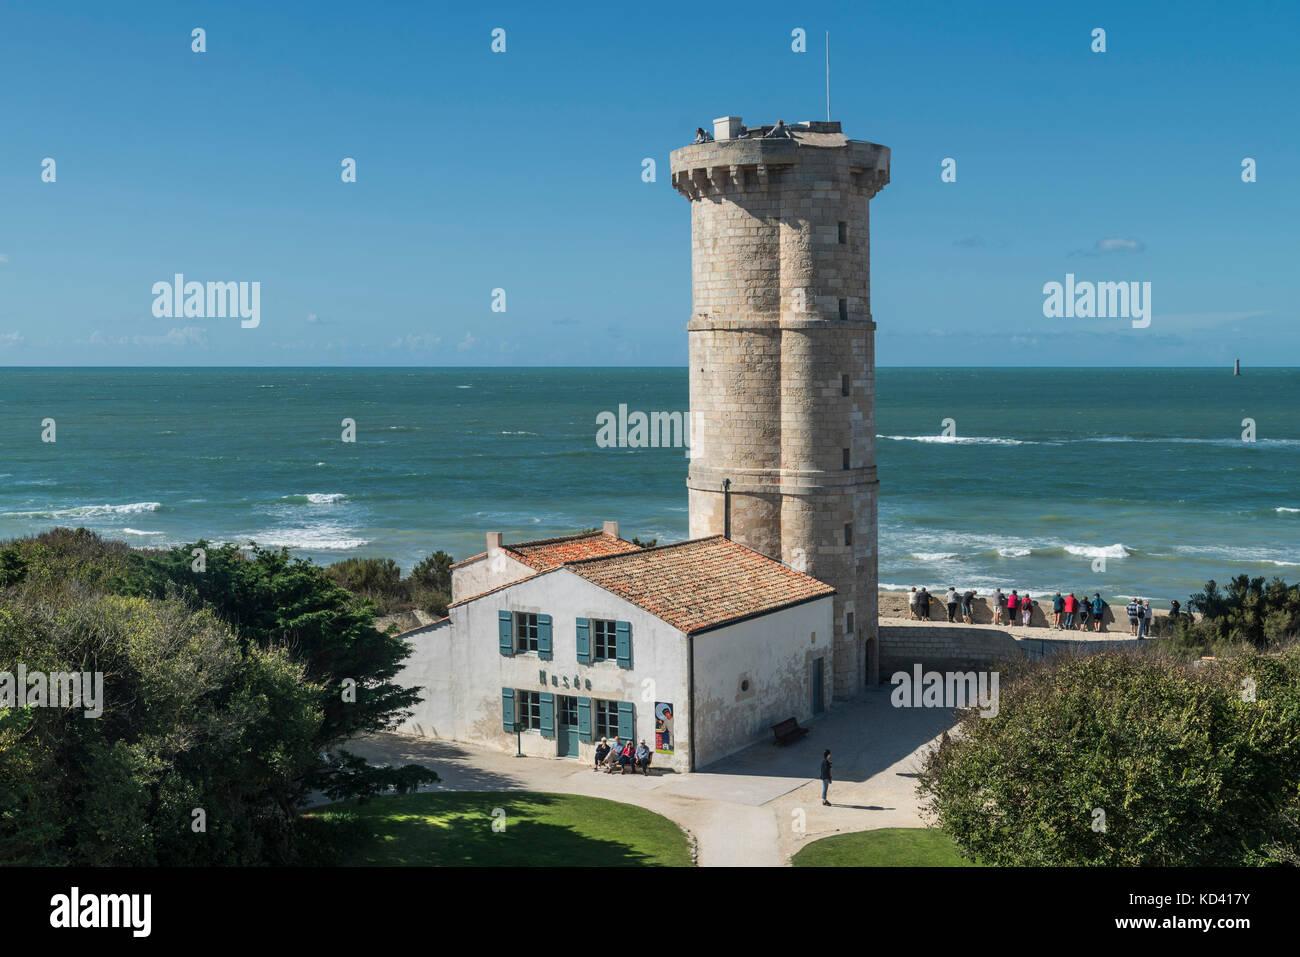 Phare des Baleines, lighthouse, Ile de Re, Nouvelle-Aquitaine, french westcoast, france, - Stock Image